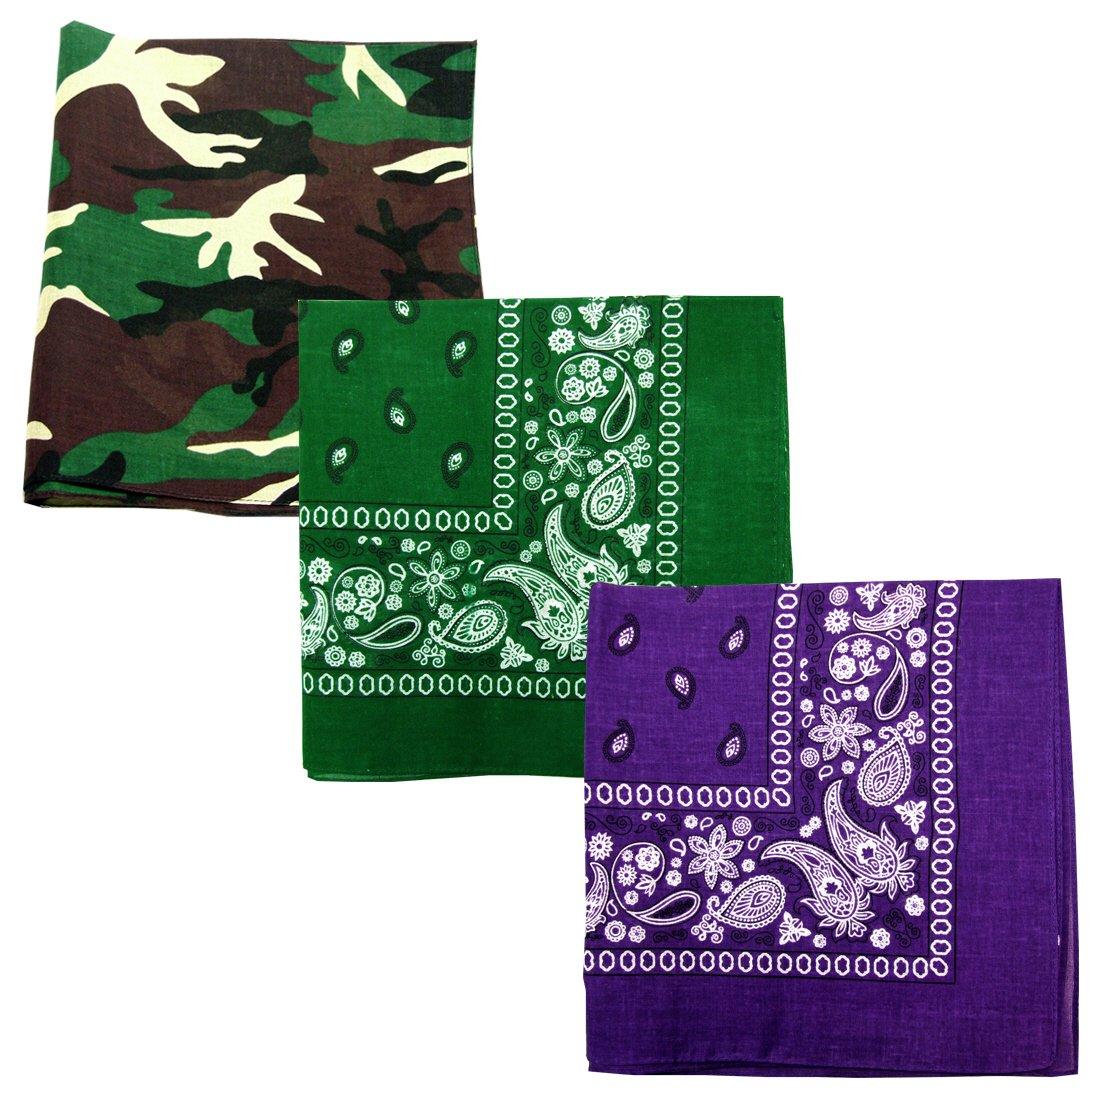 Paisley 3 piece Assorted Cotton Bandanas (Camo / Forest Green / Purple)